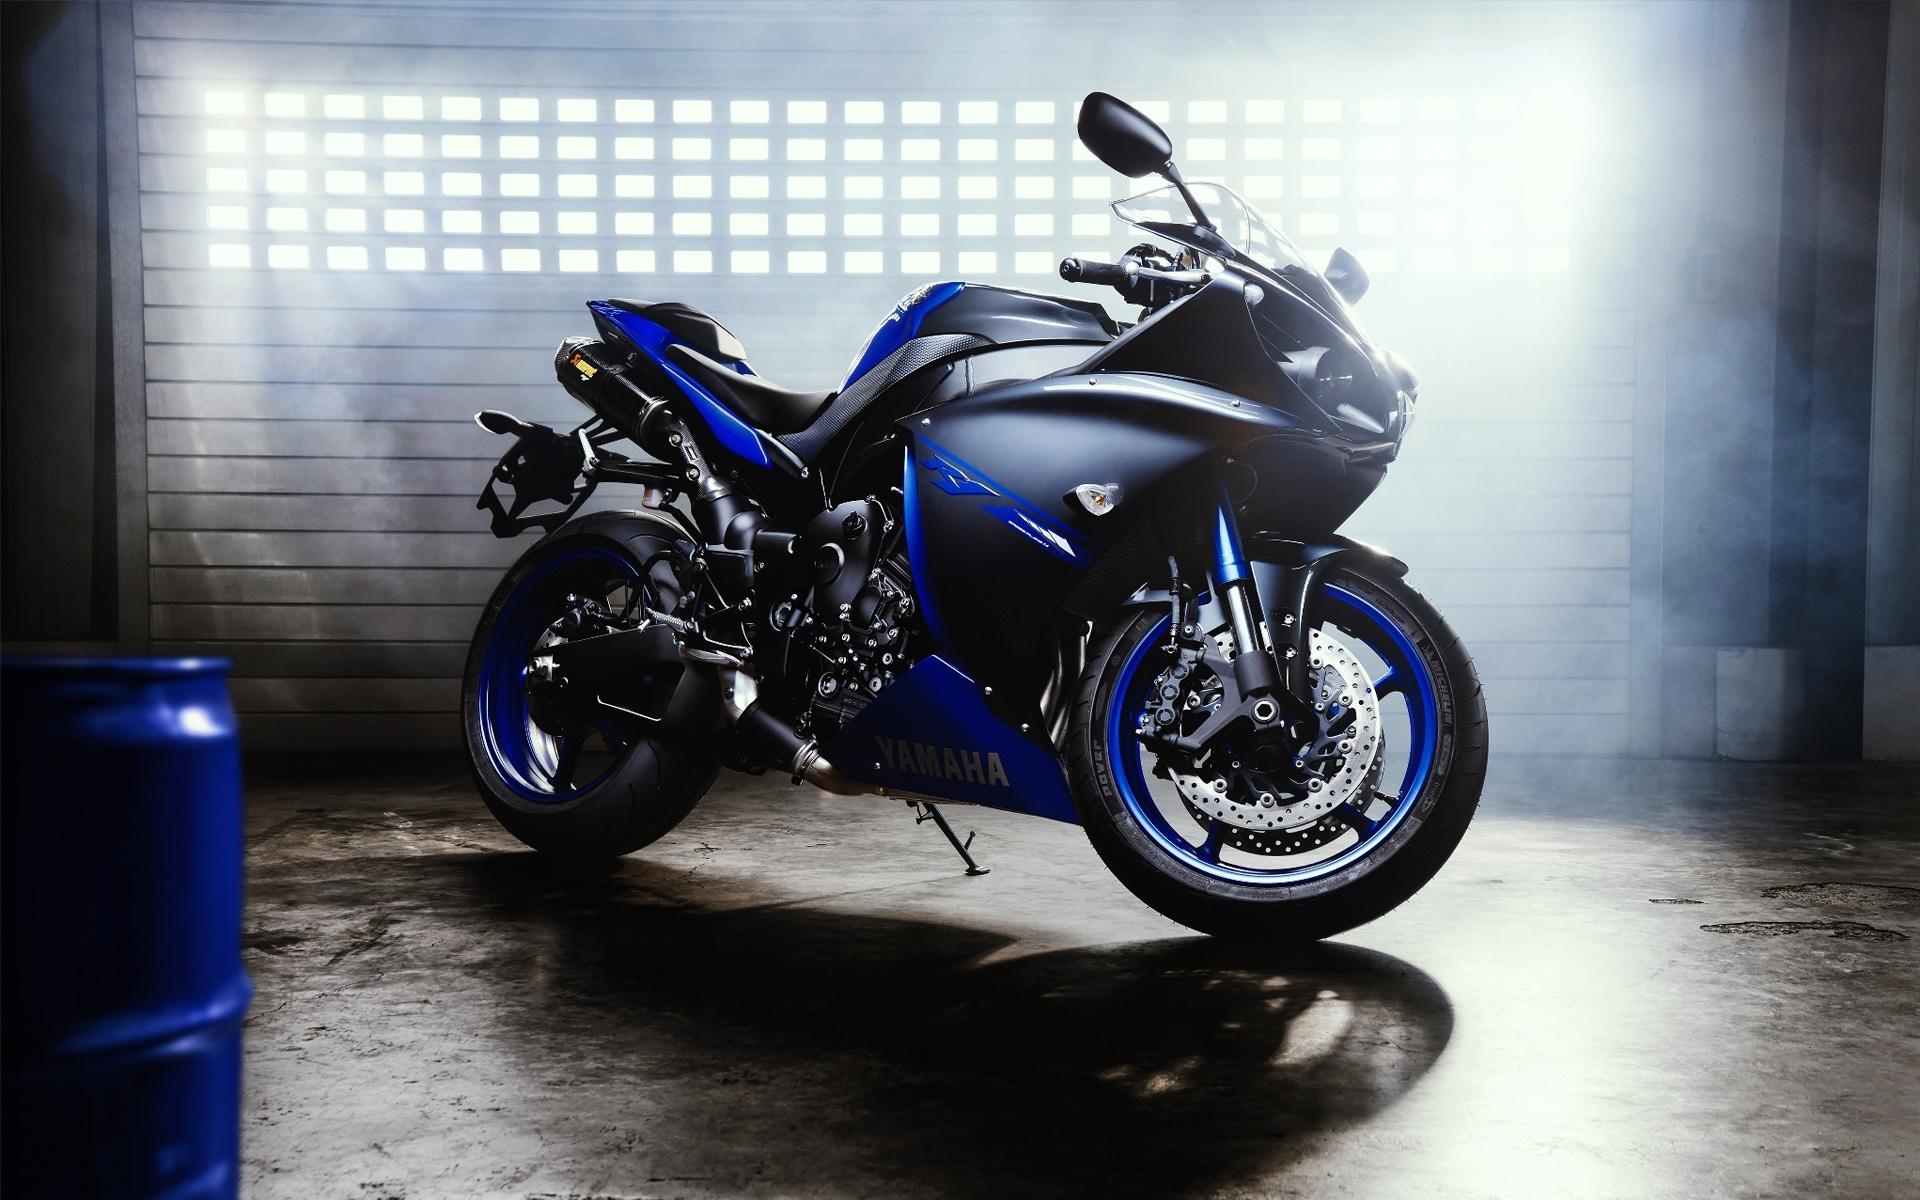 Картинка: Байк, мотоцикл, колёса, Yamaha, YZF R1, чёрный, синий, свет